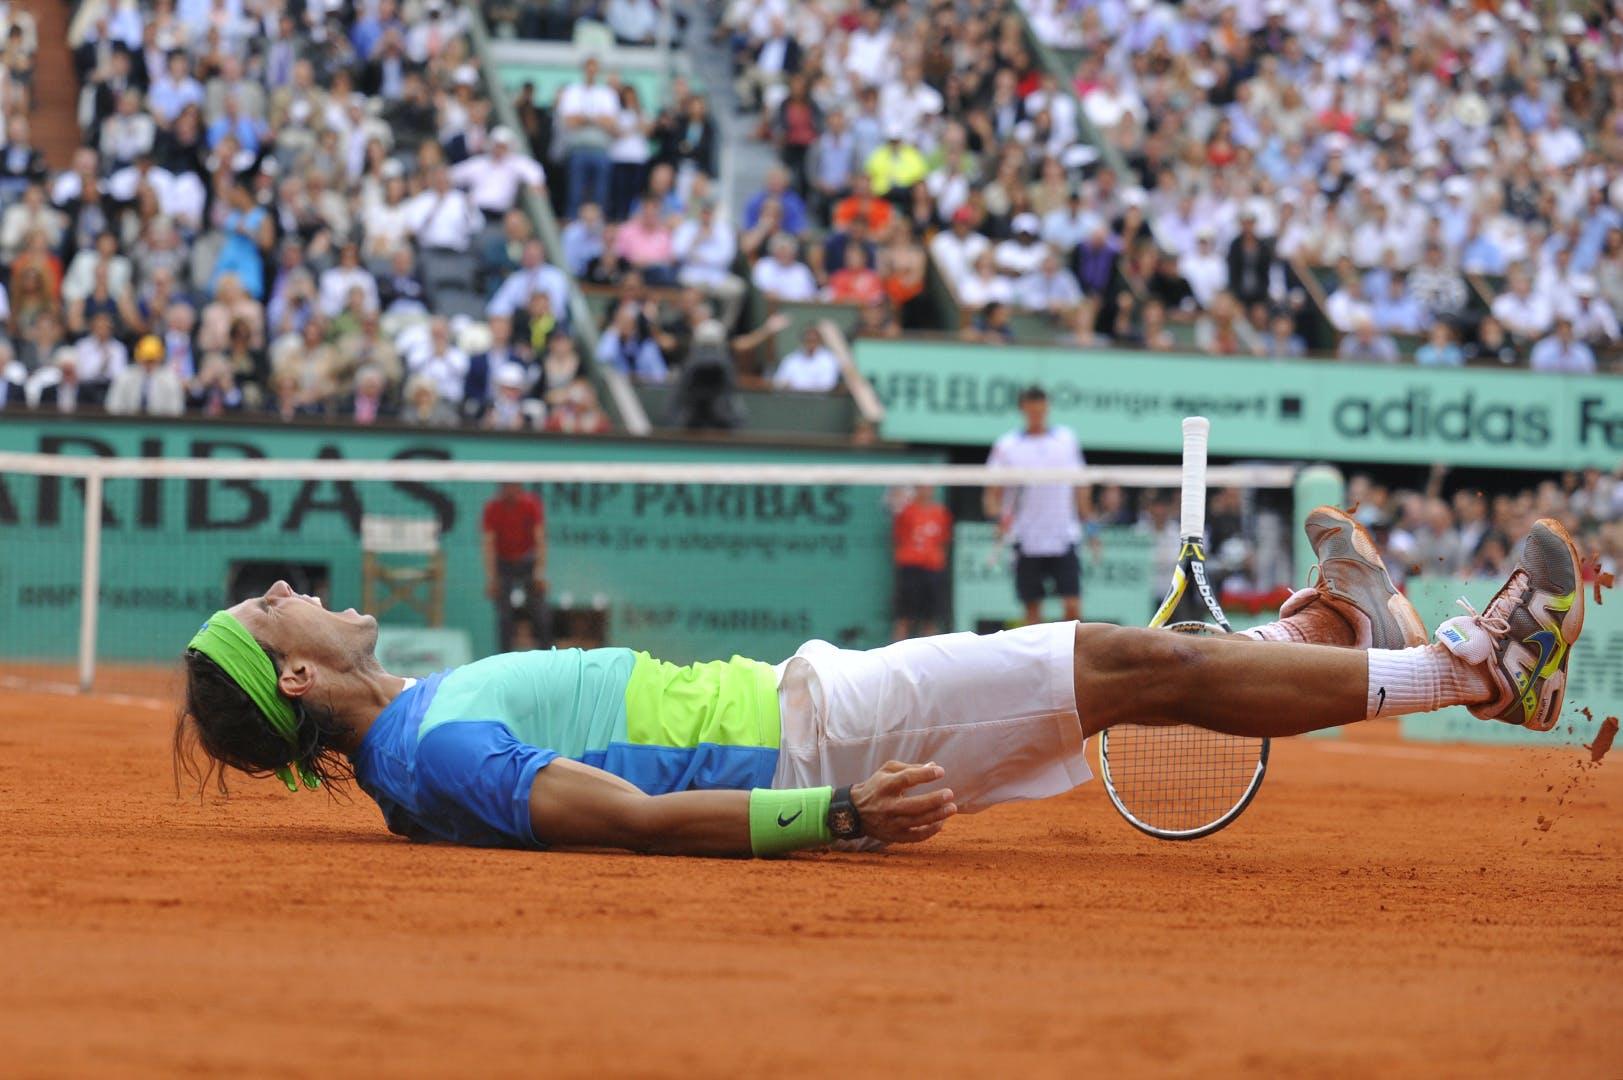 Victoire Rafael Nadal Roland-Garros 2010